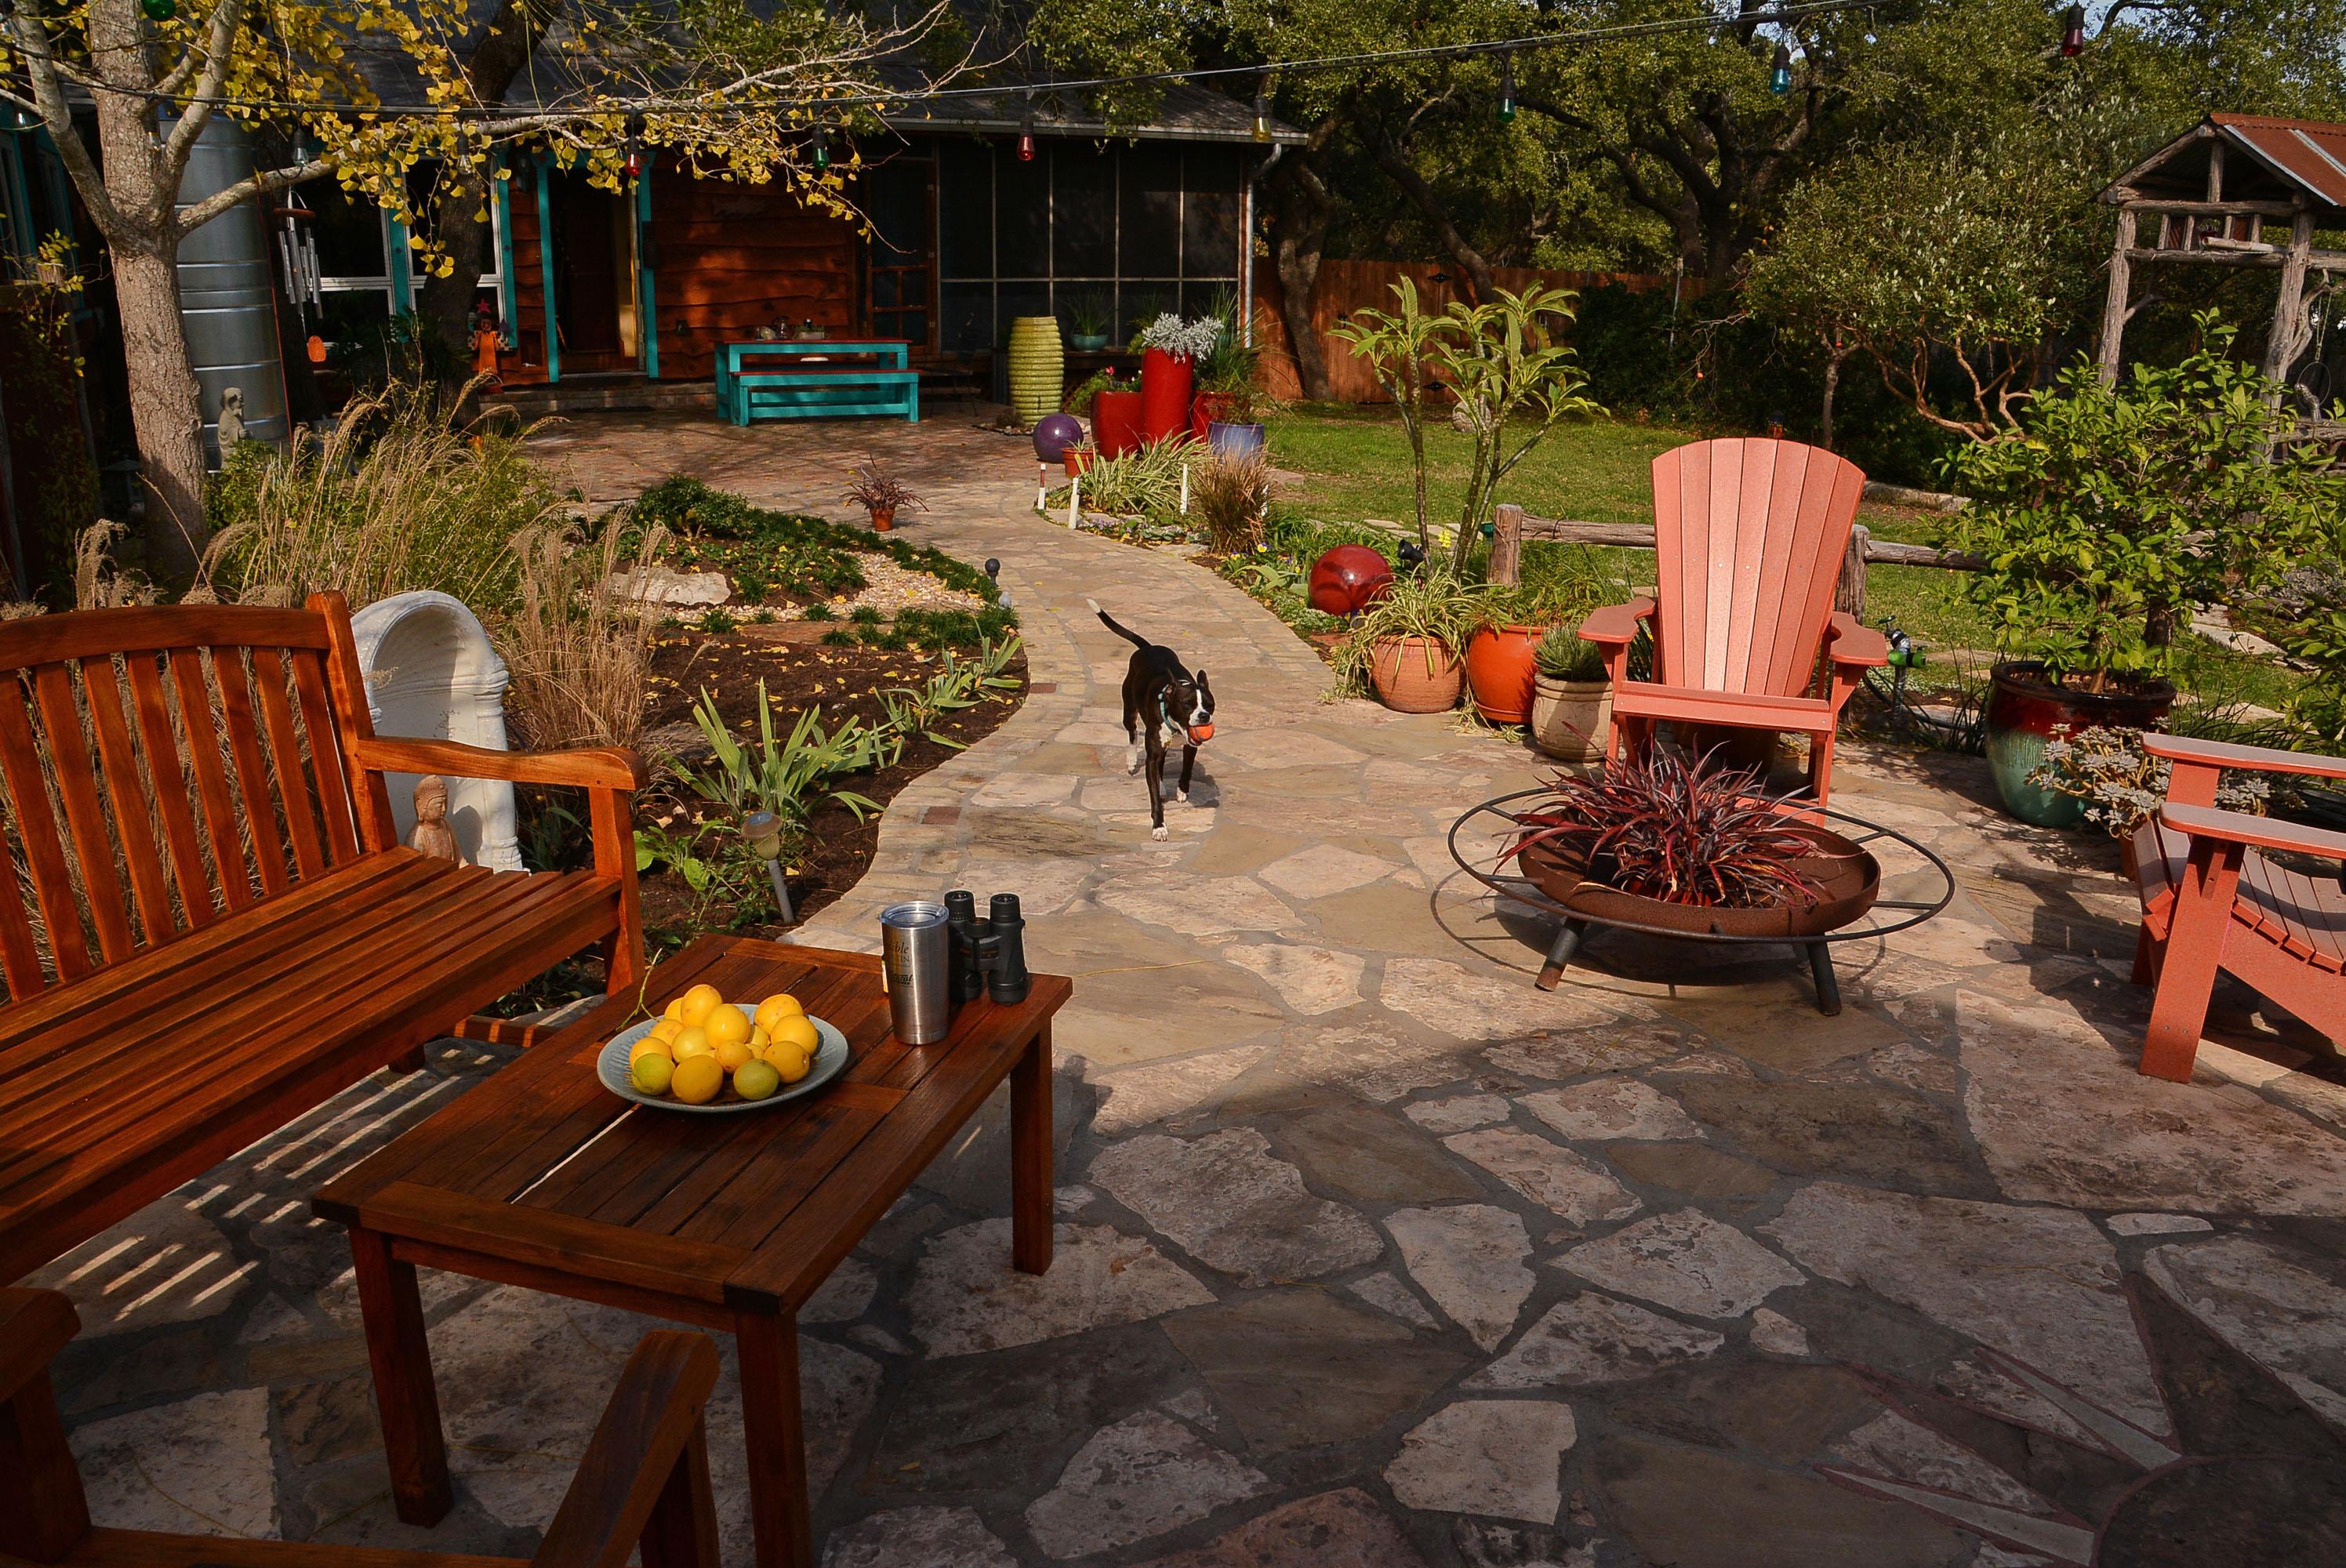 Flagstone path patio cute dog Lobo Central Texas Gardener